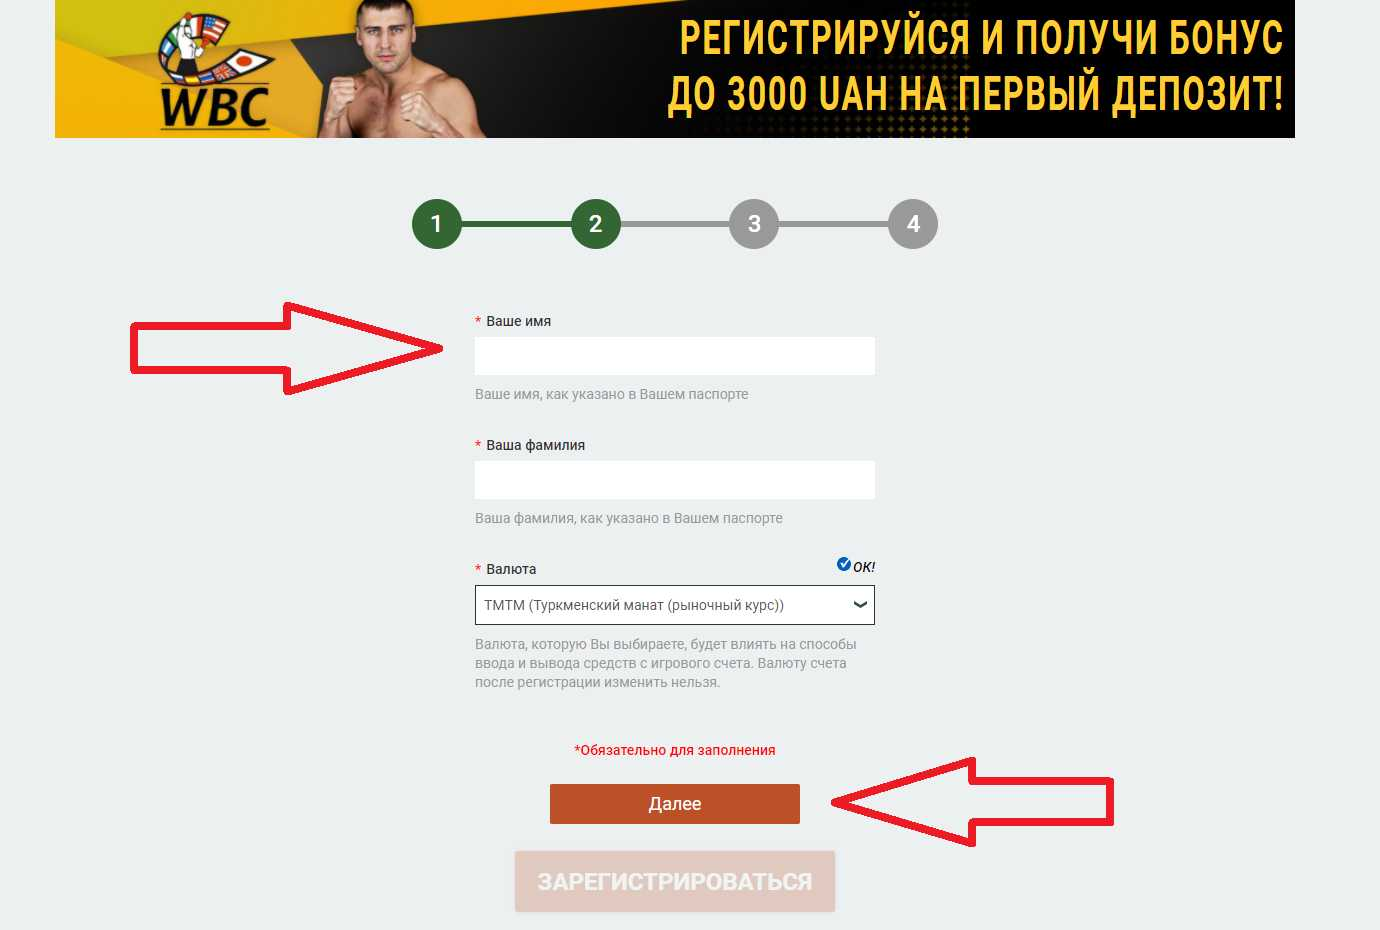 Промокод Мелбет при регистрации: шанс получить до 110$